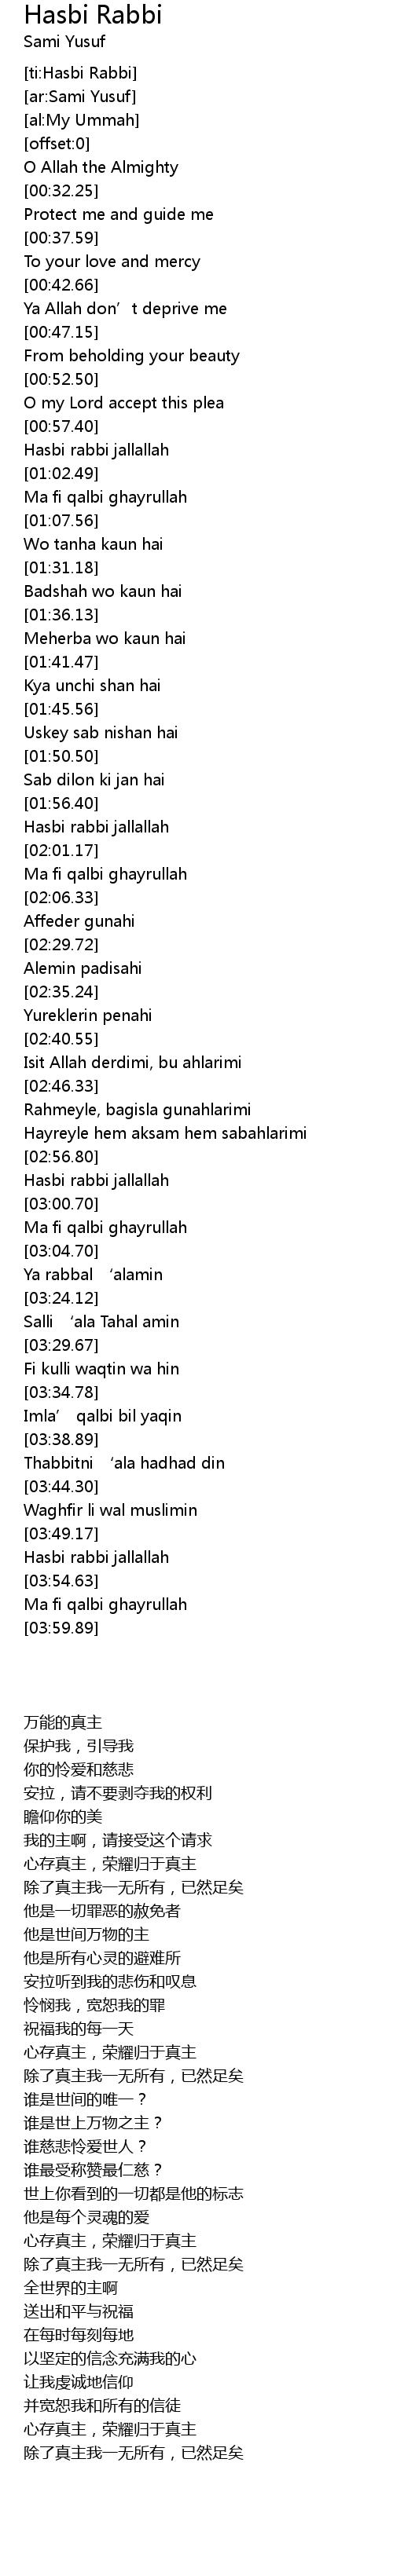 Sami Yusuf Allahu Allahu Lyrics